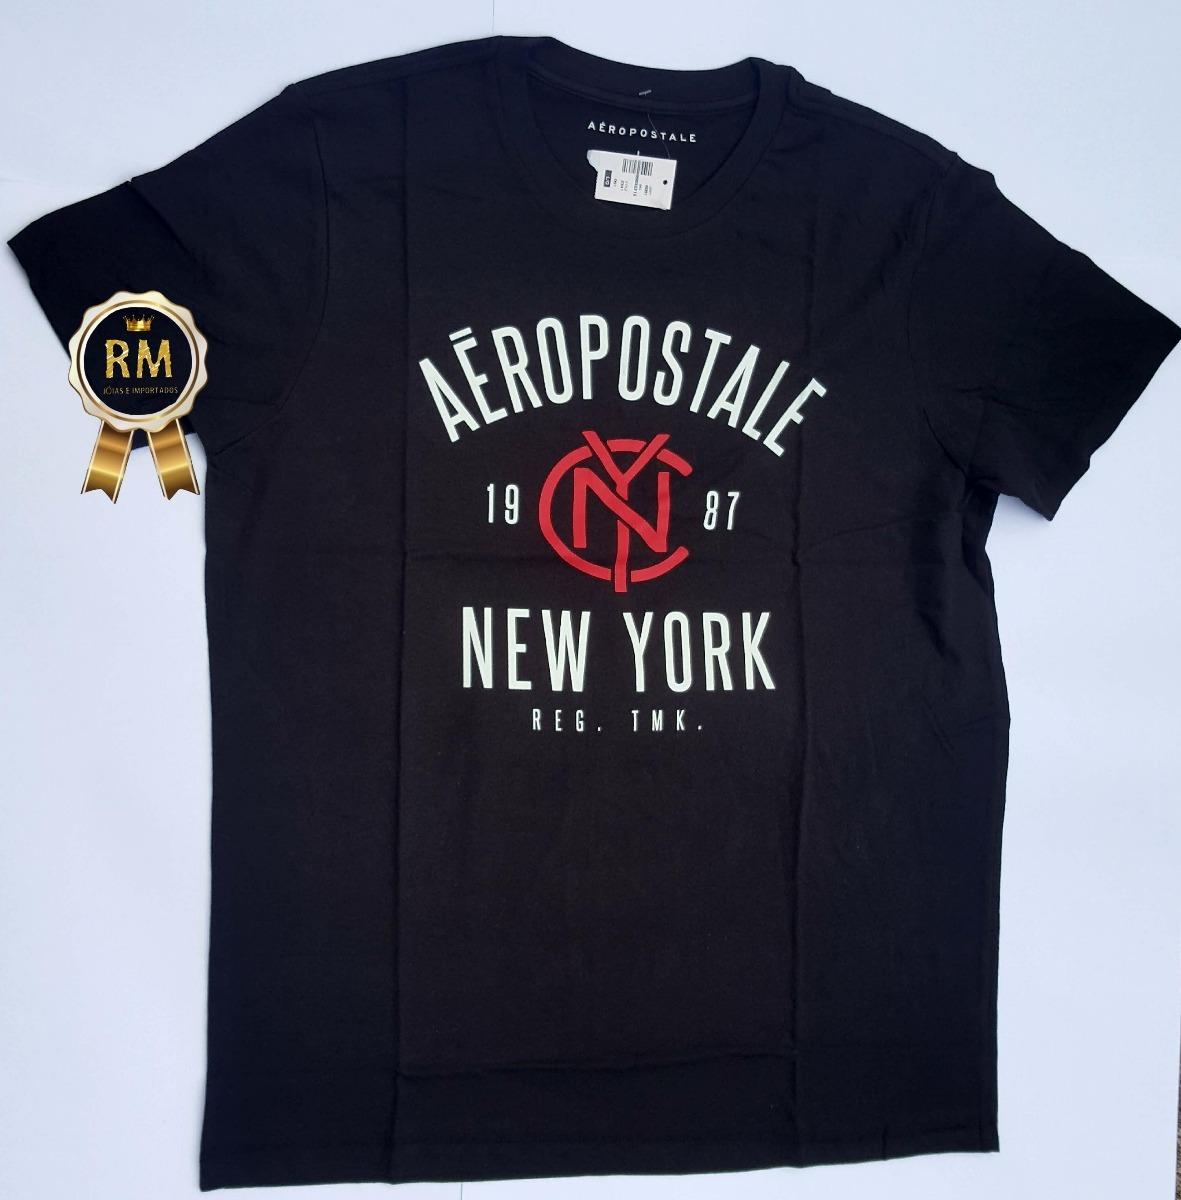 a59a01ef58af0 camisetas blusas aeropostale 100% original pronta entrega ! Carregando zoom.